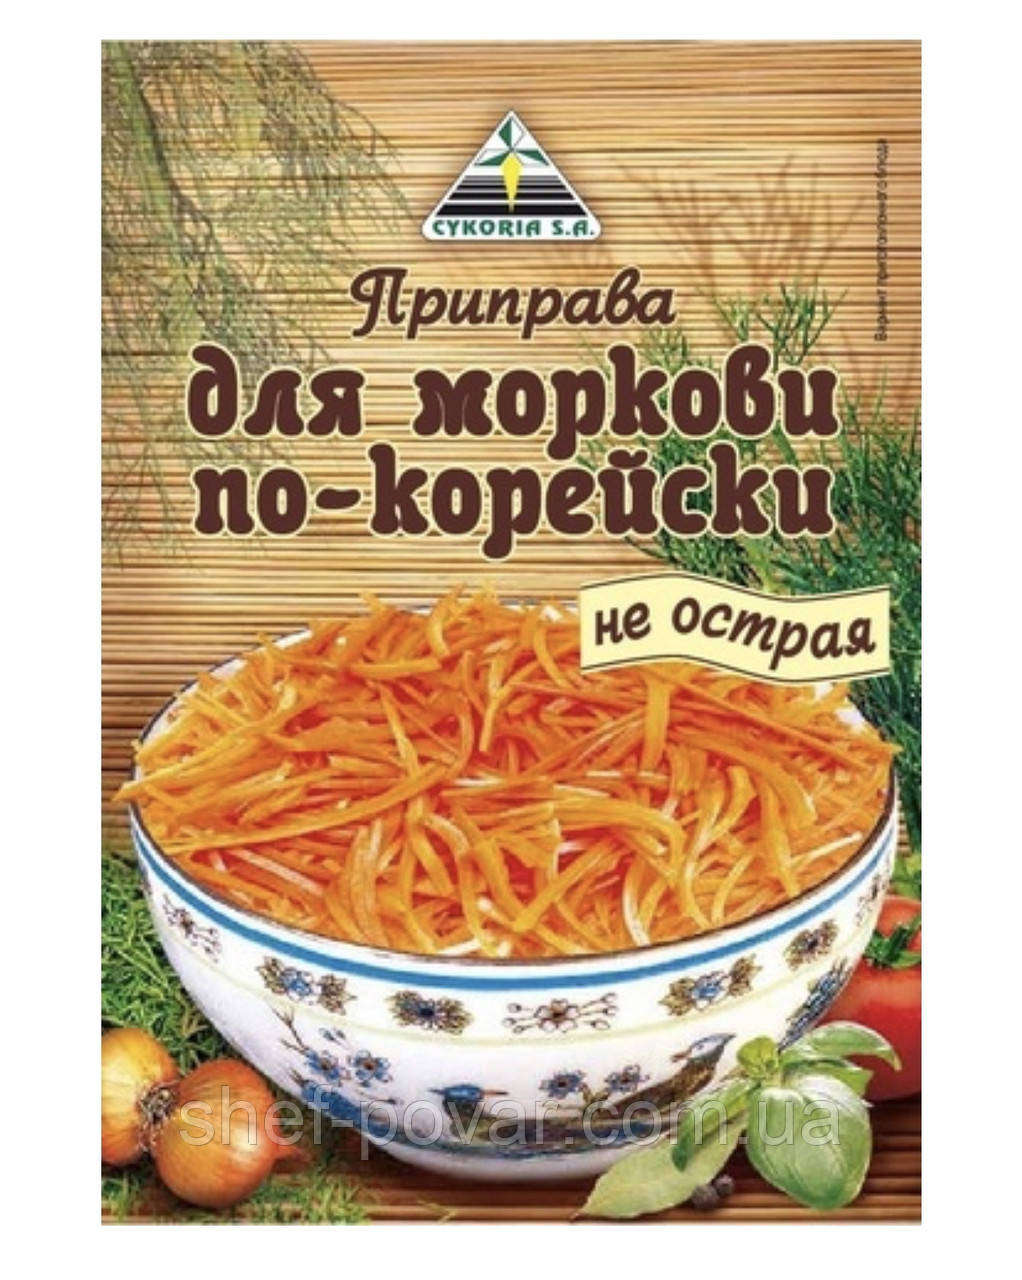 "Приправа для моркови по-корейски не острая 20гр  ТМ «Cykoria s. a."""